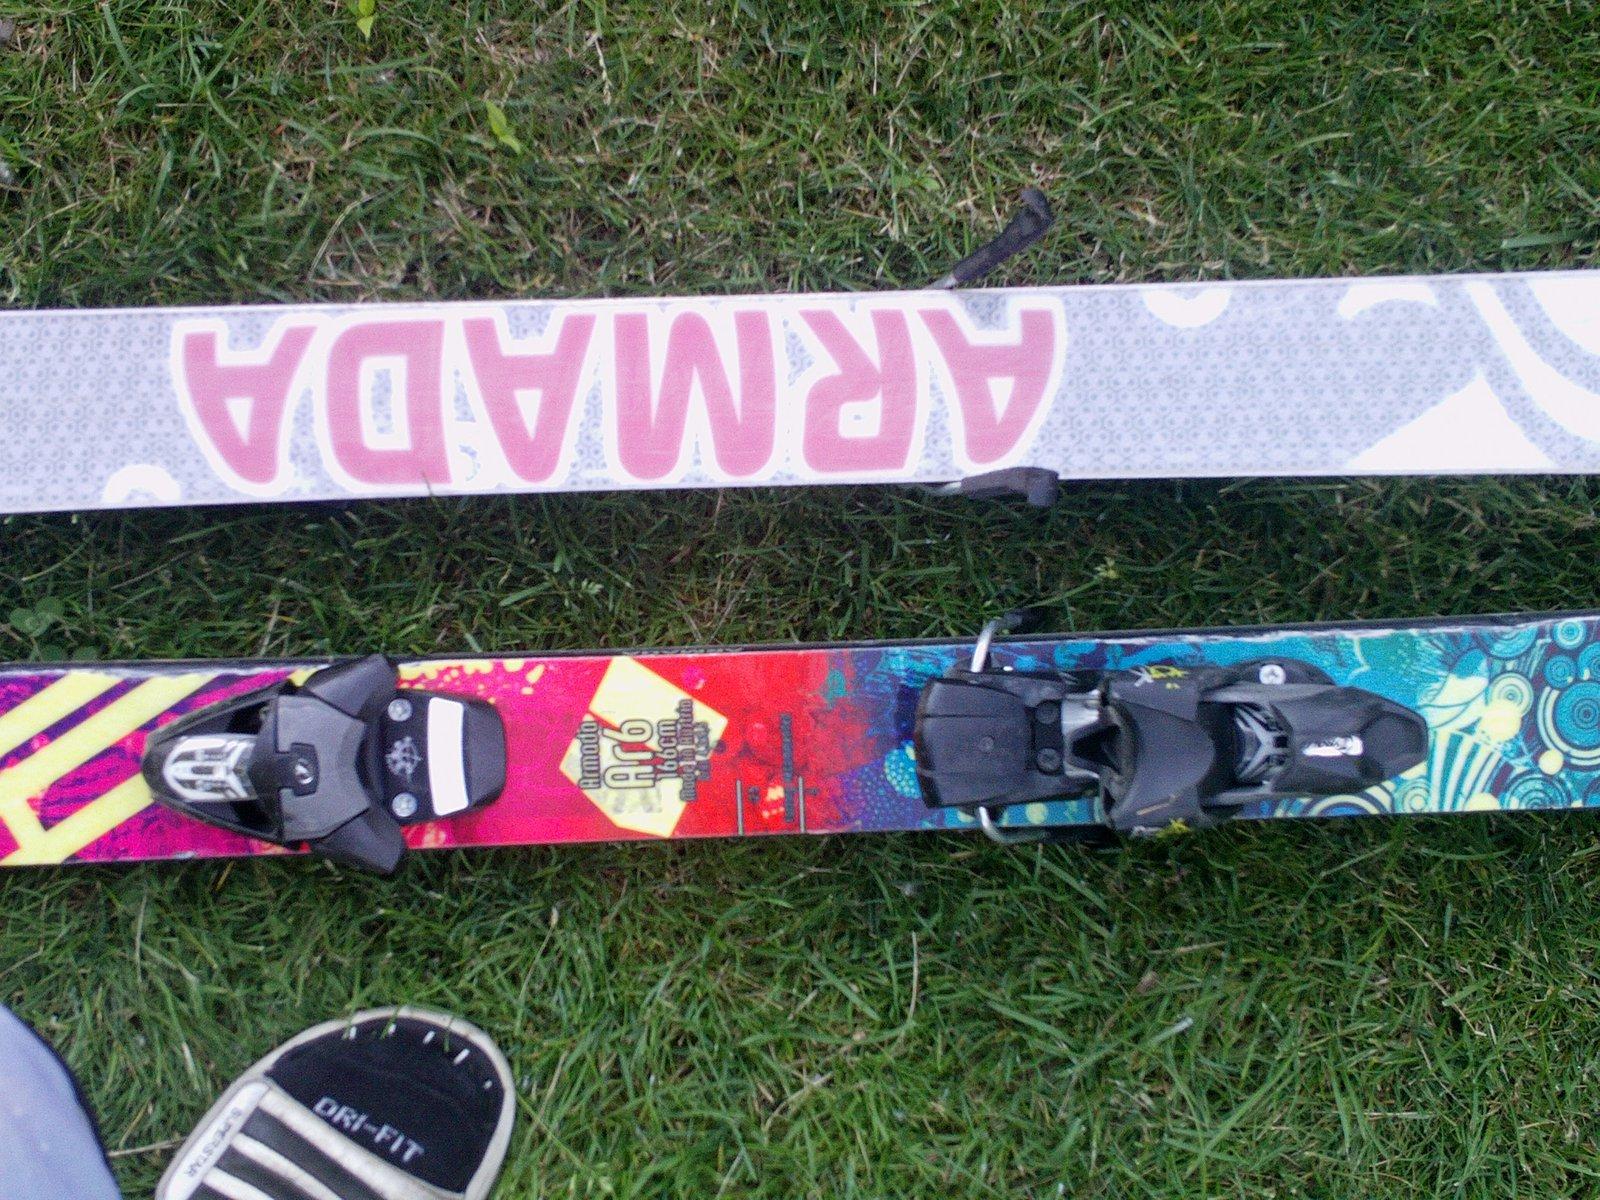 Ski for sale - 1 of 2